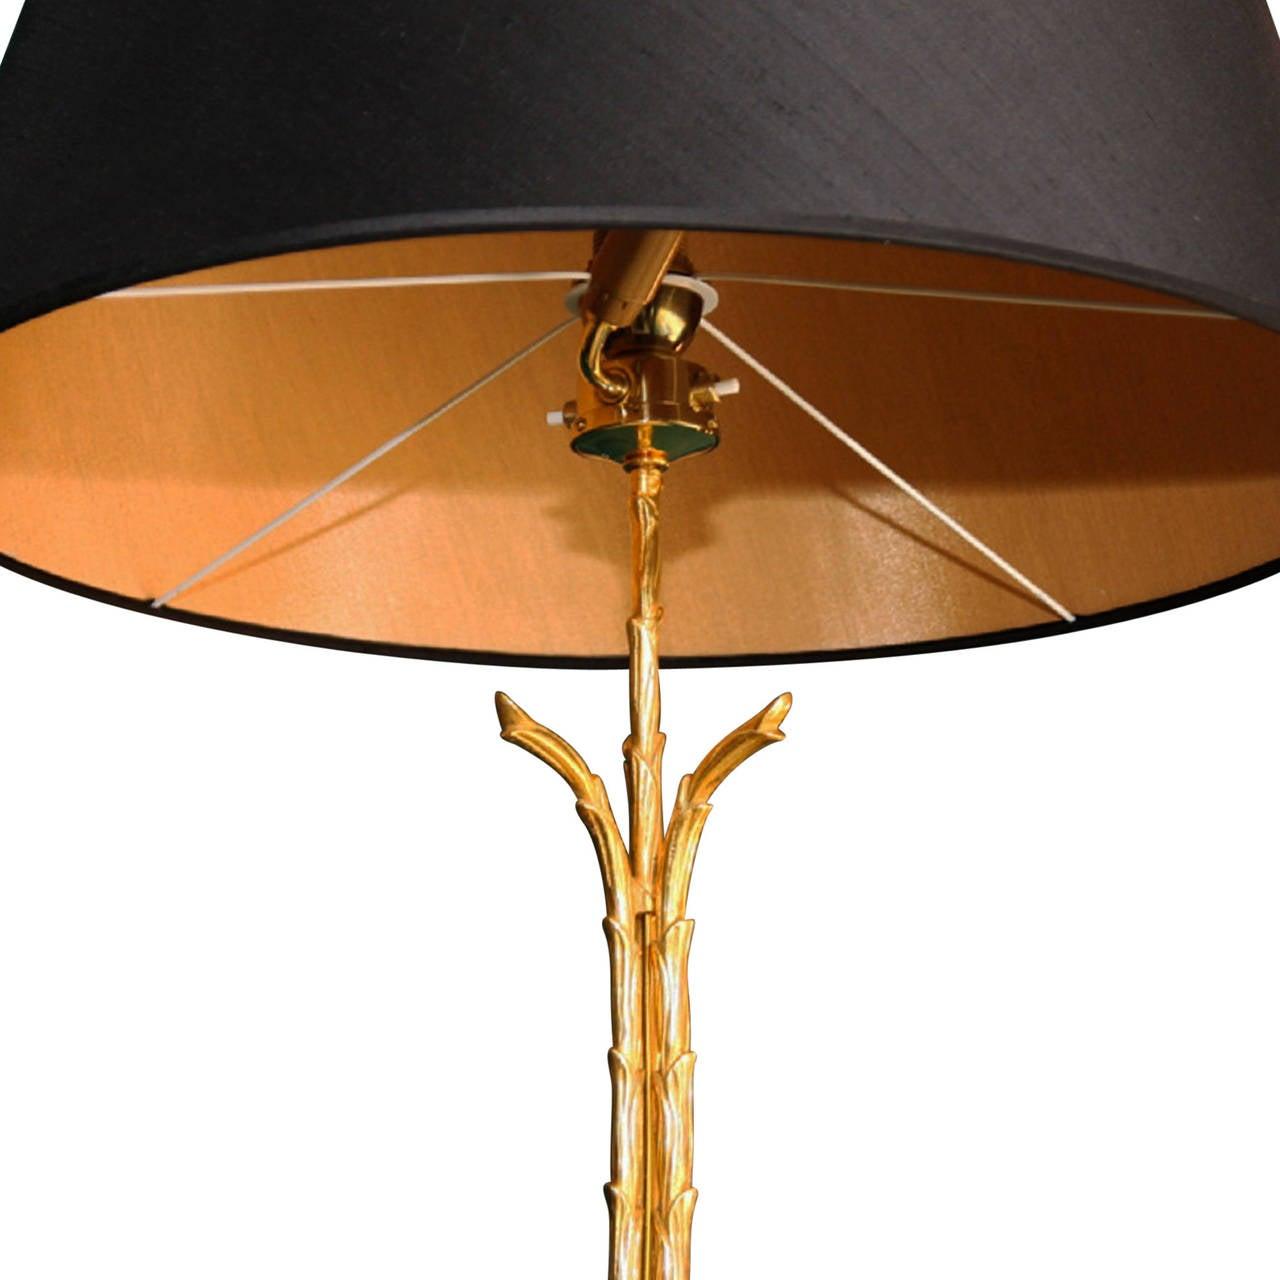 dor bronze floor lamp by bagu s french 1940s for sale. Black Bedroom Furniture Sets. Home Design Ideas